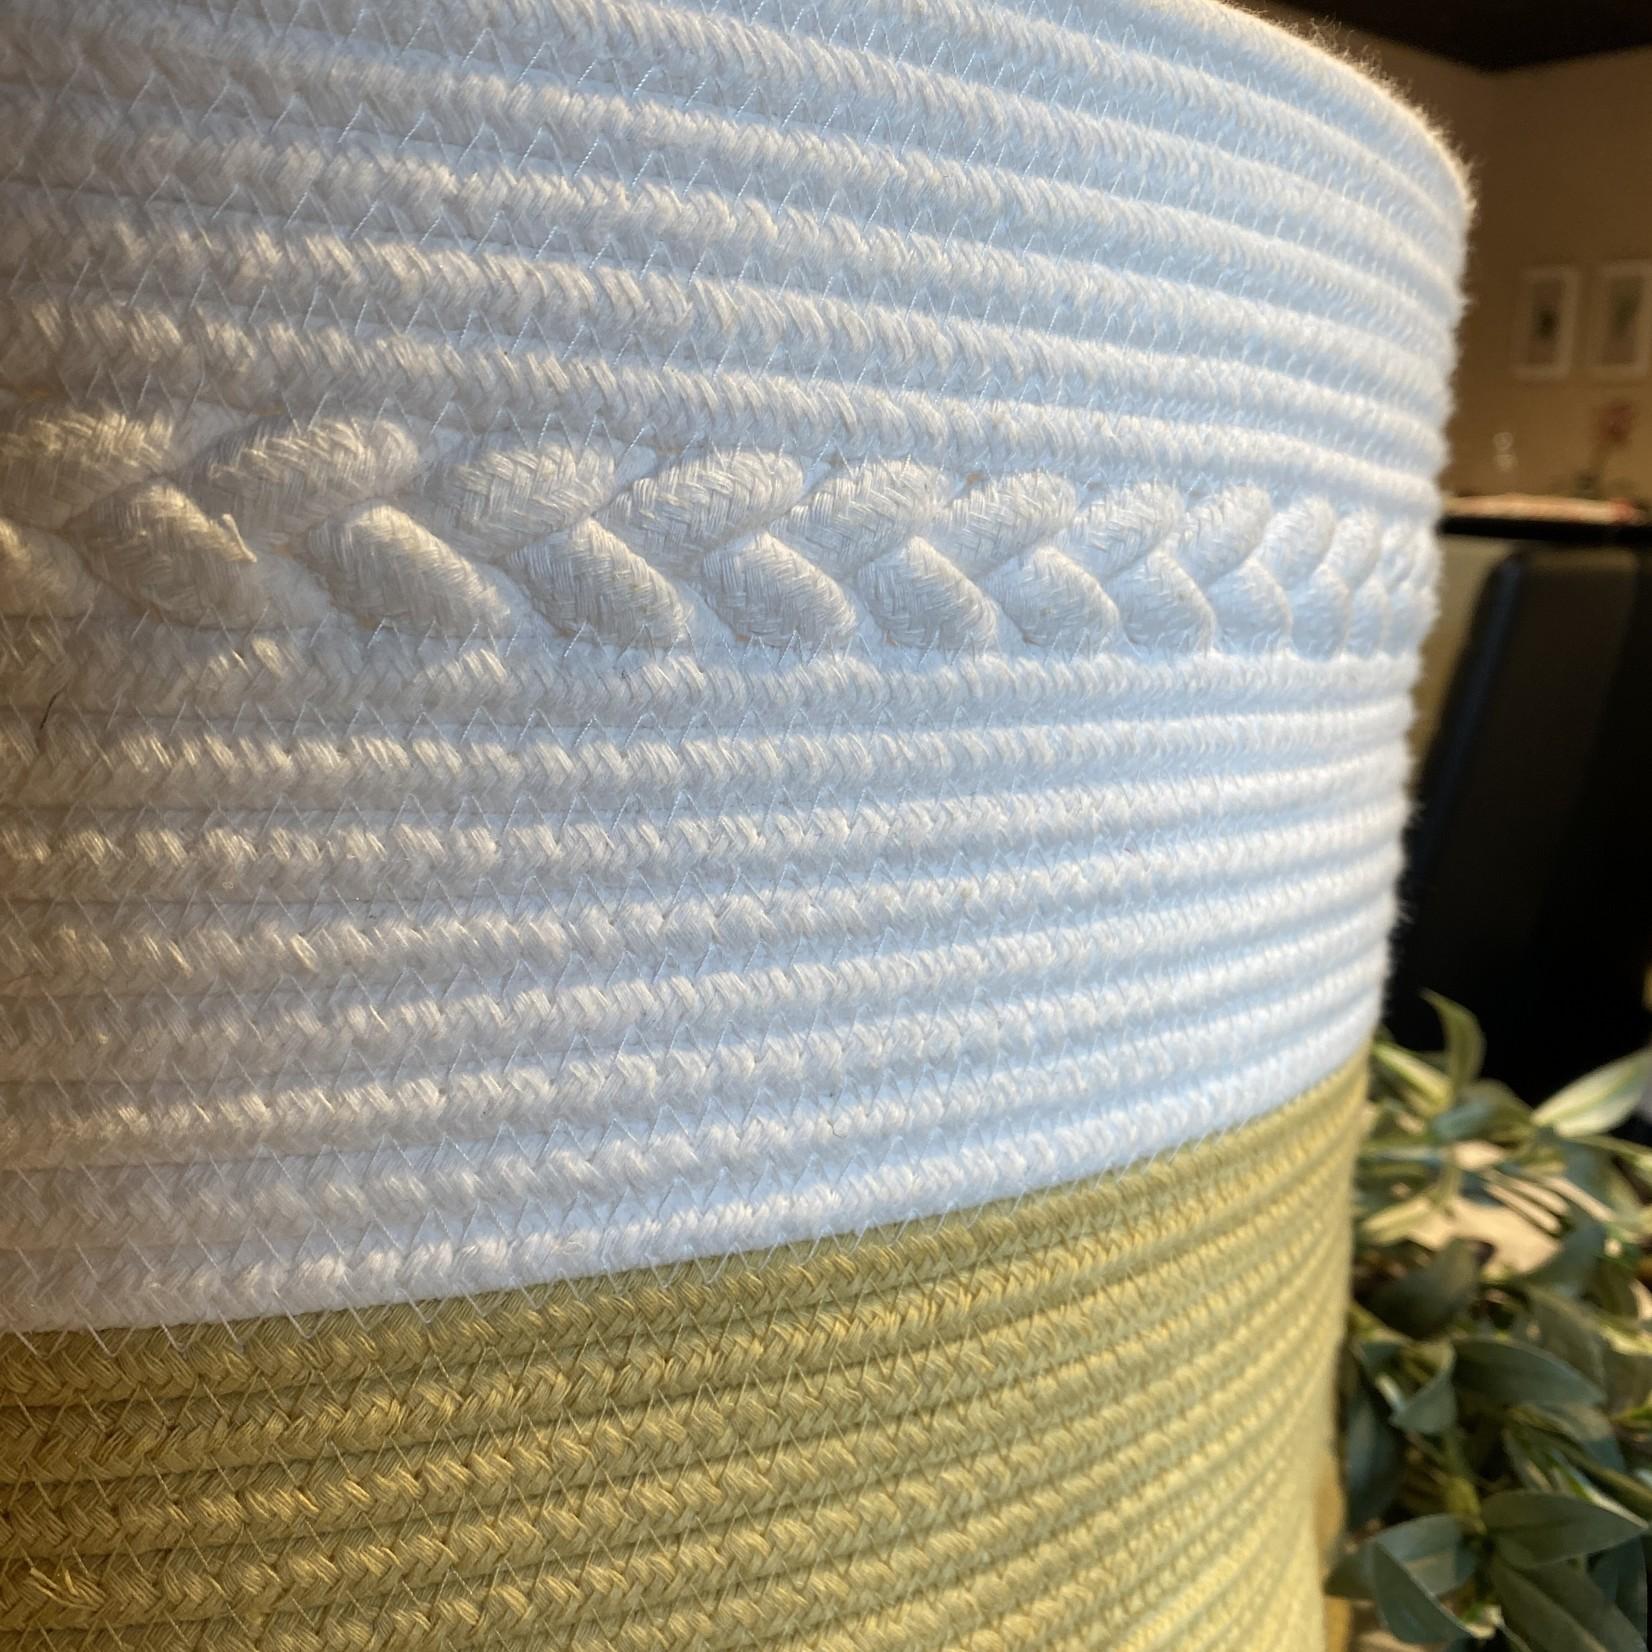 Medium - Tan/White Woven Basket